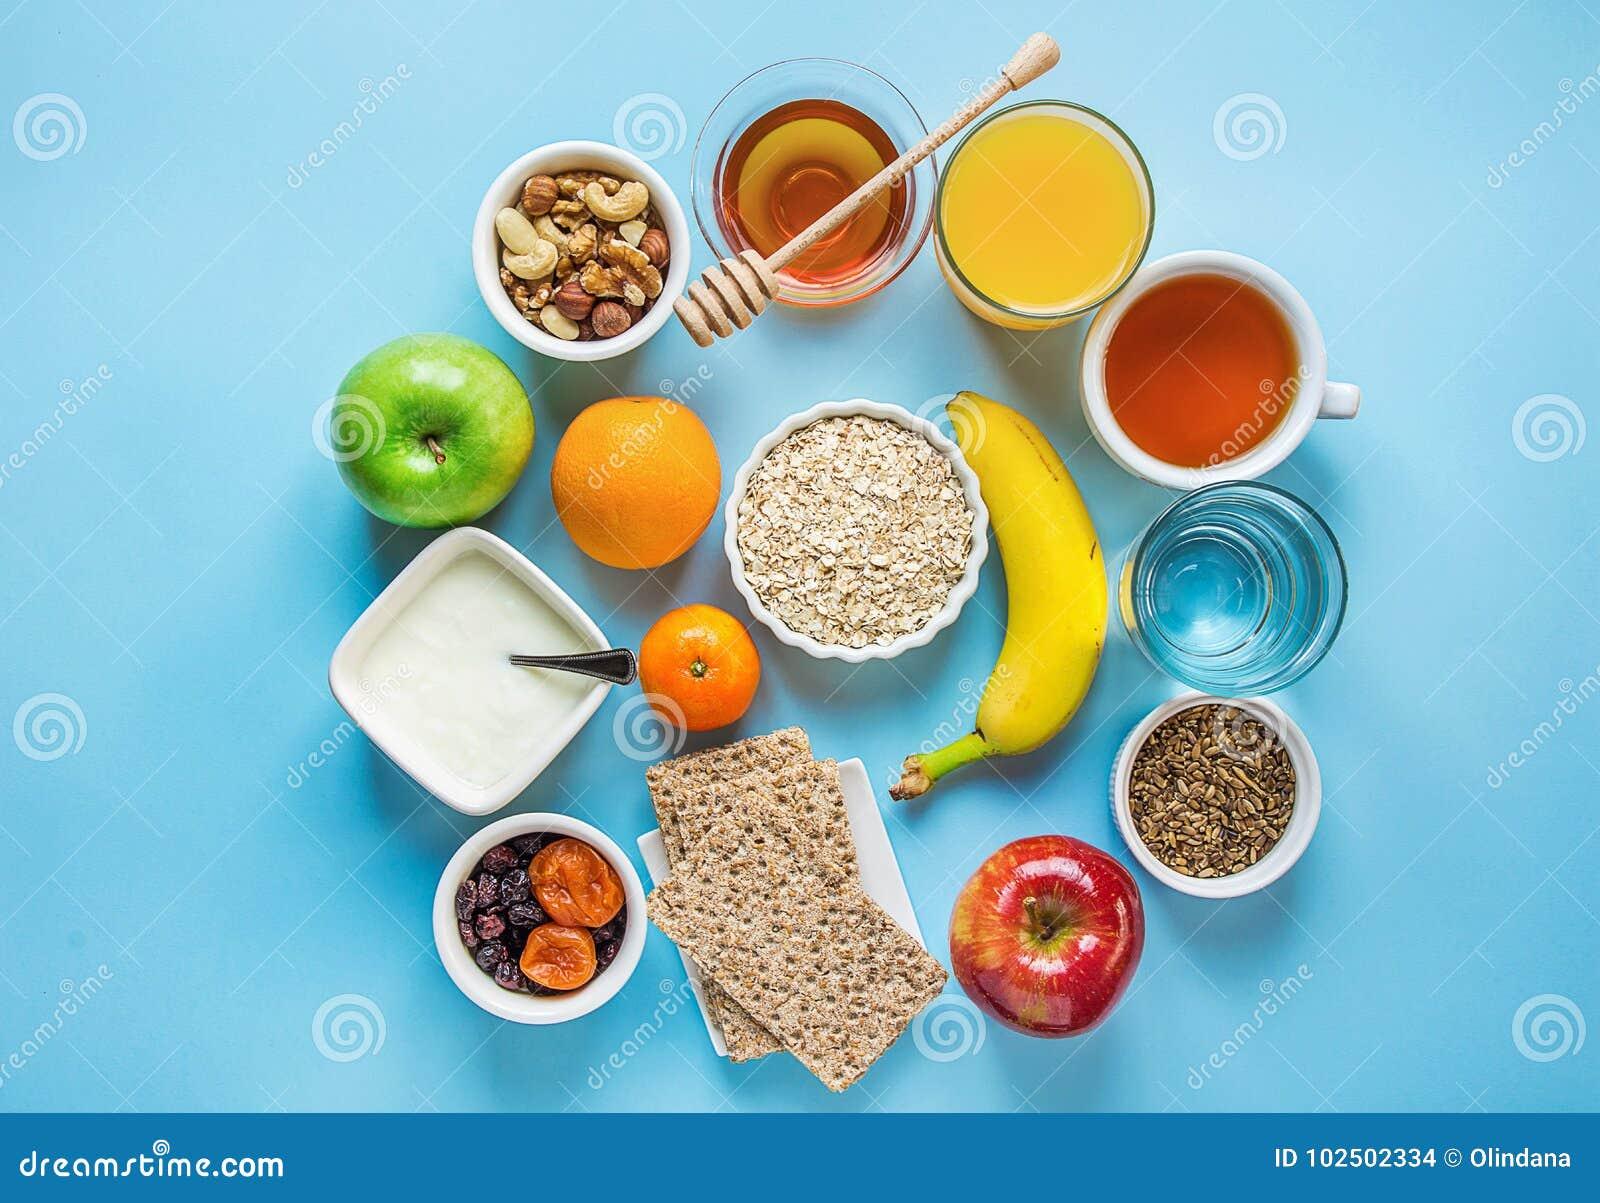 Gesundes Frühstücks-Faser-Quellverdauungs-Hafermehl Honey Fruits Apples Banana Orange Juice Water Green Tea Nuts Hellblaue Tabell